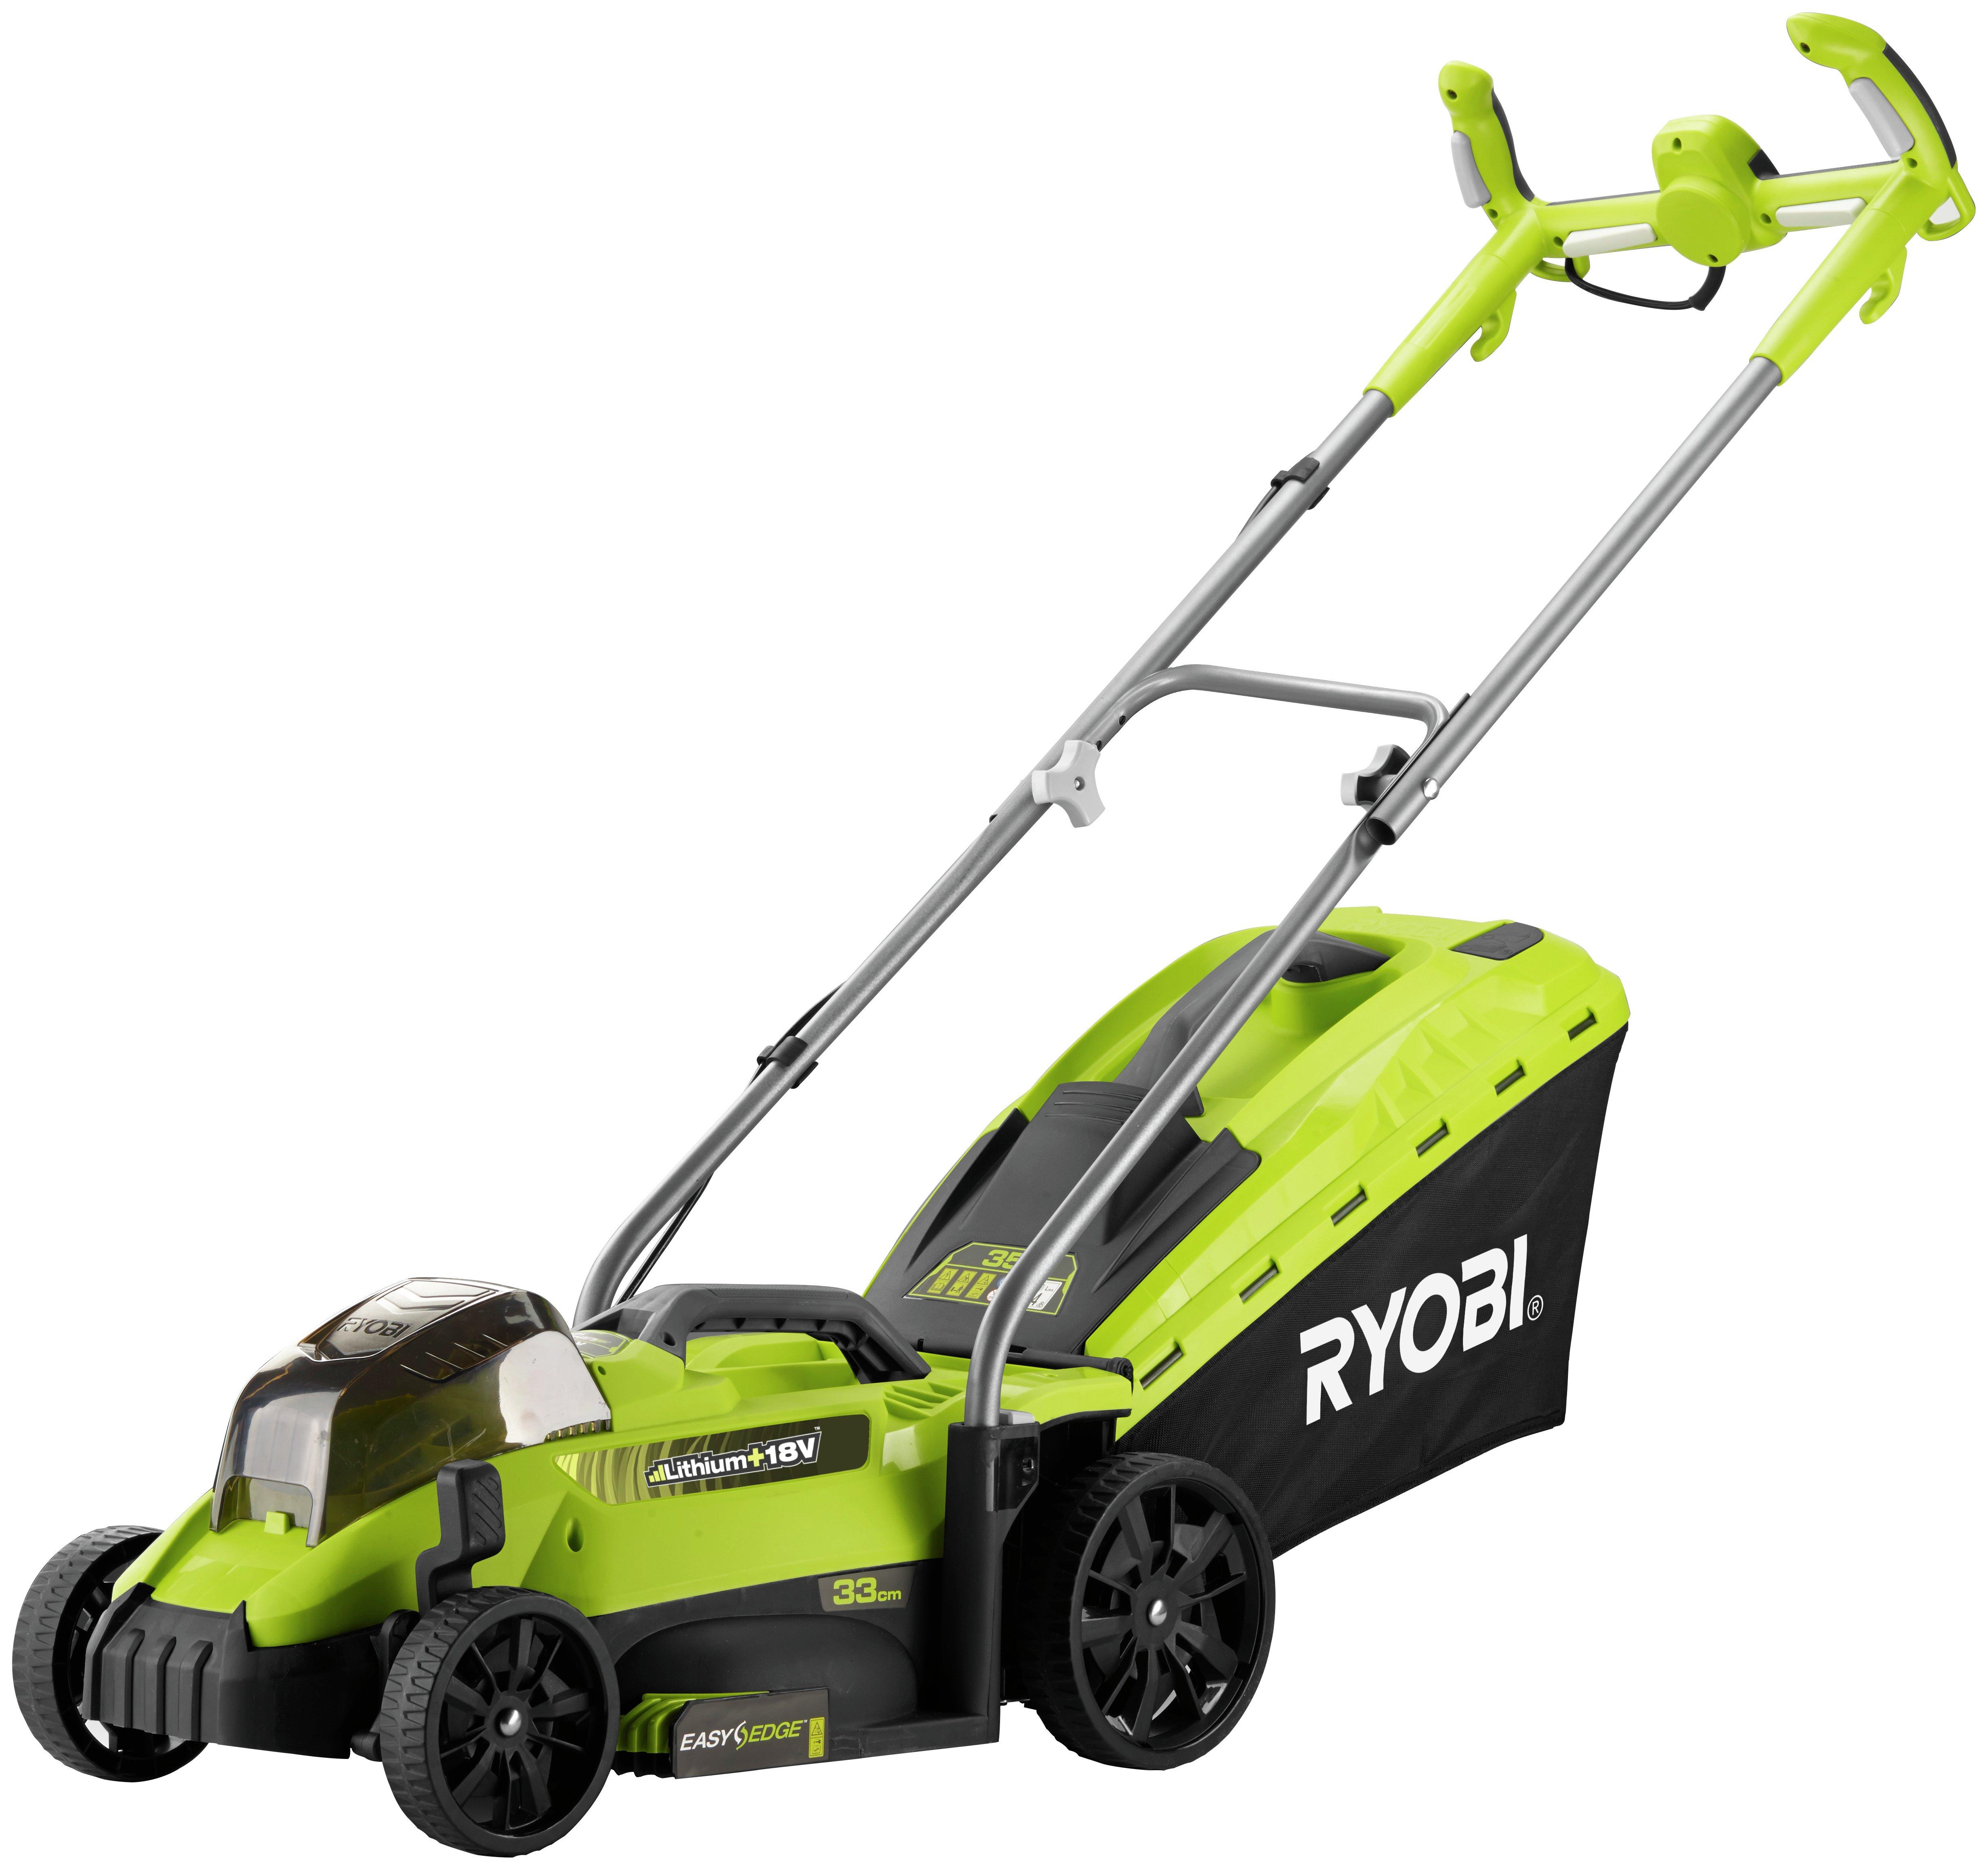 Ryobi 18V 33cm Bare Lawnmower - No Battery.